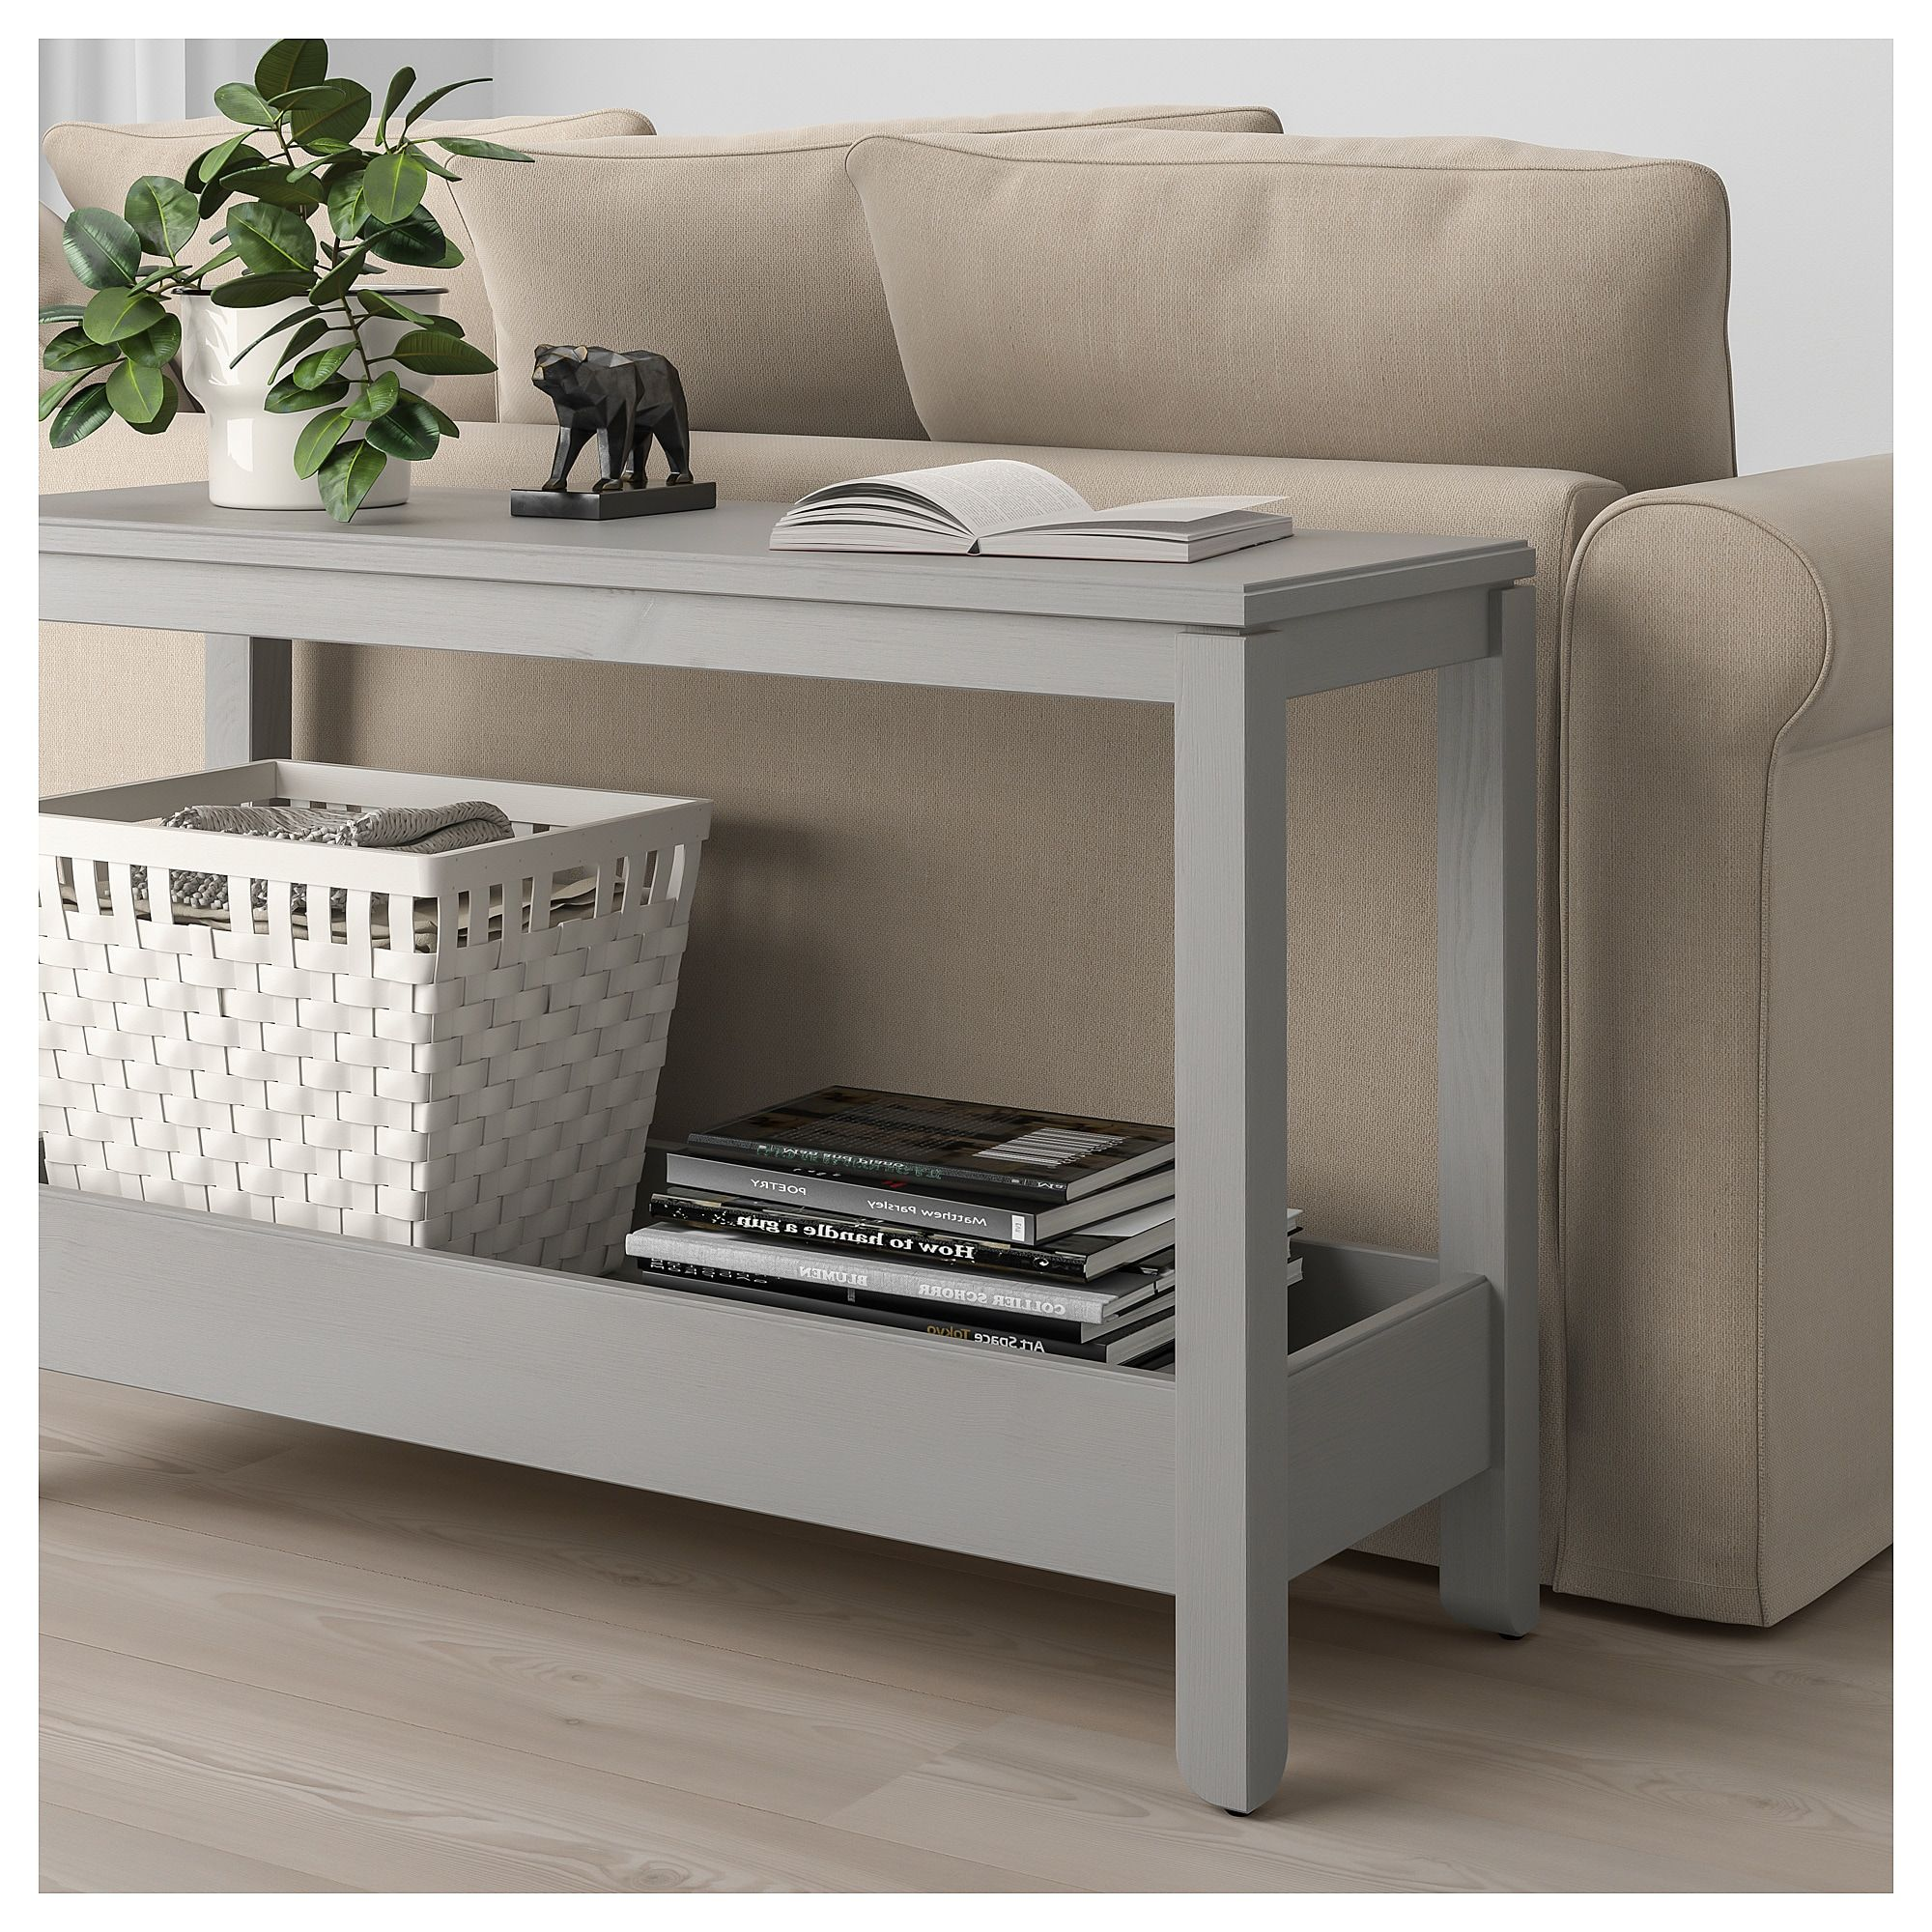 Ikea Havsta Console Table Gray Ikea Console Table Console